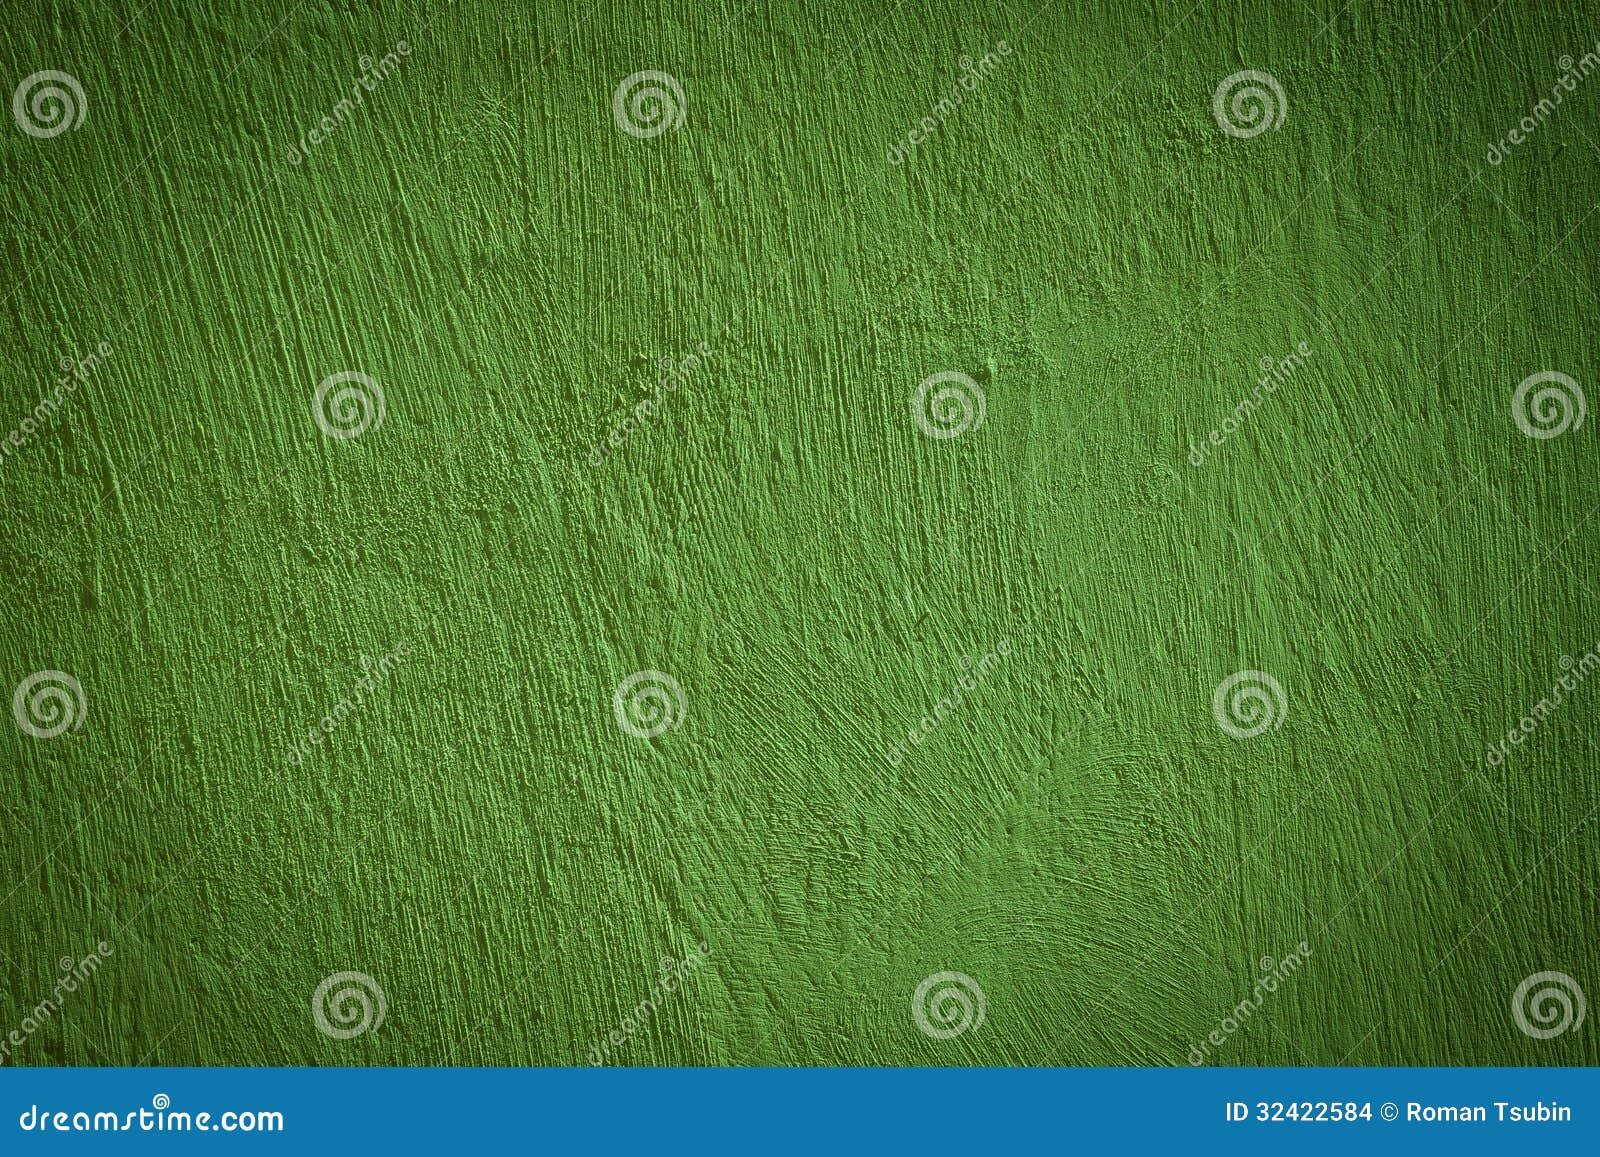 elegant green backgrounds - photo #20